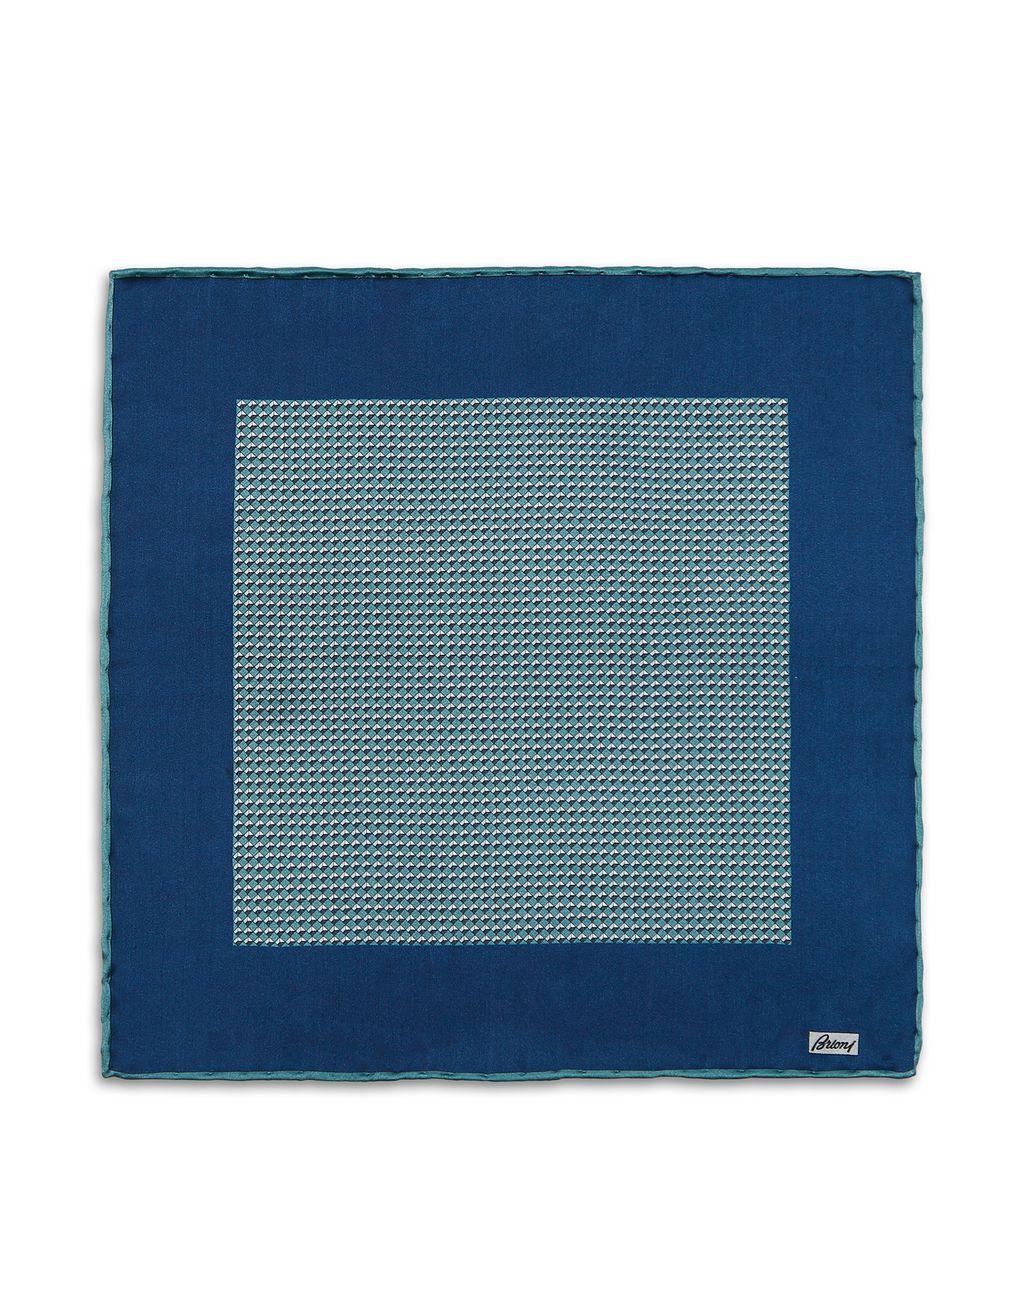 BRIONI Бирюзовый платок-паше с микроузором Галстуки и карманные платки [*** pickupInStoreShippingNotGuaranteed_info ***] f